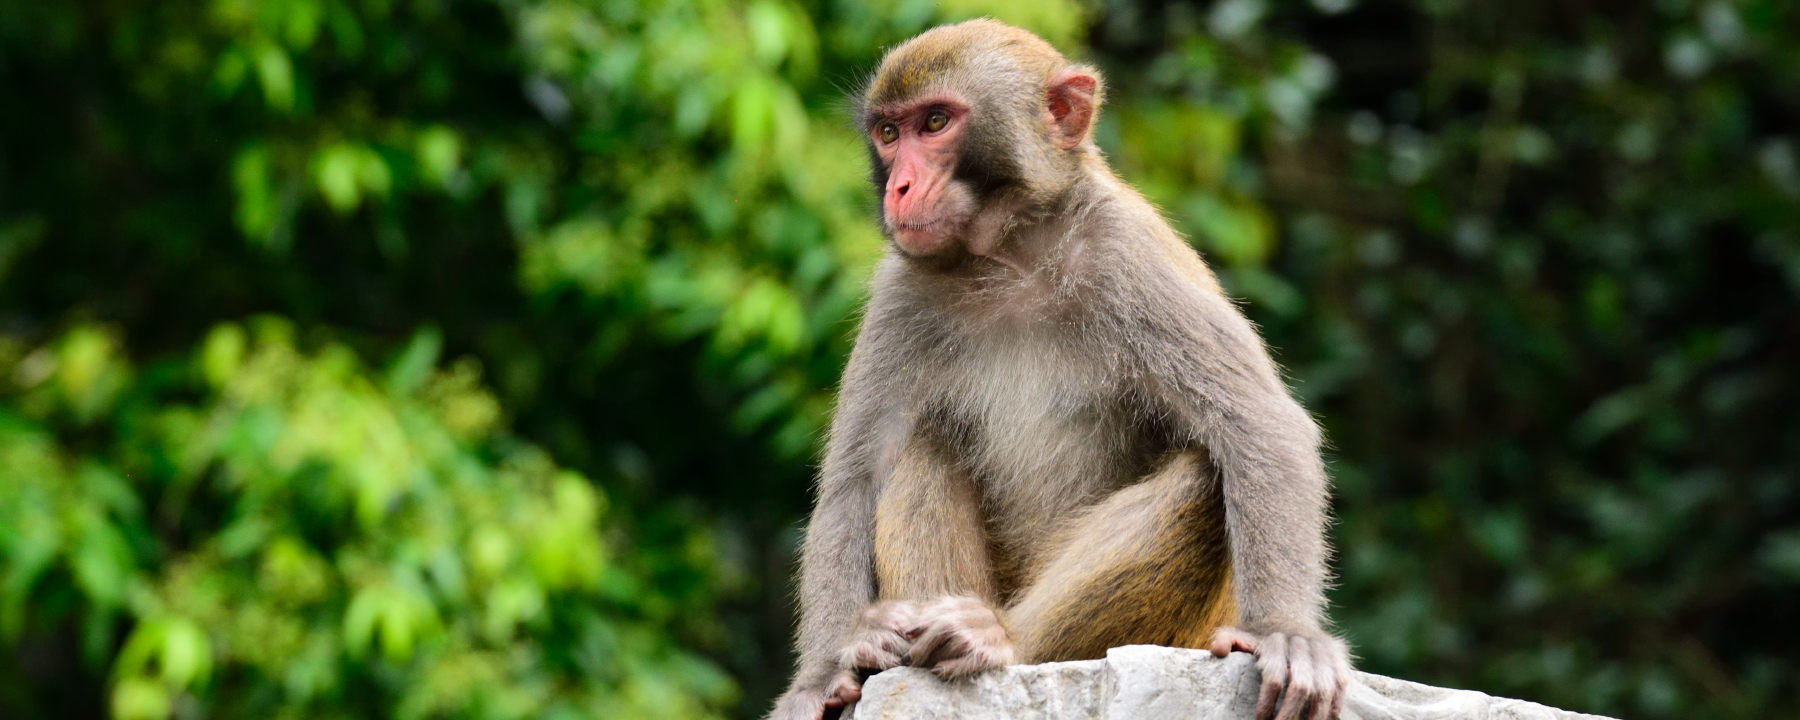 When Humans Hear Music, Monkeys May Hear Noise